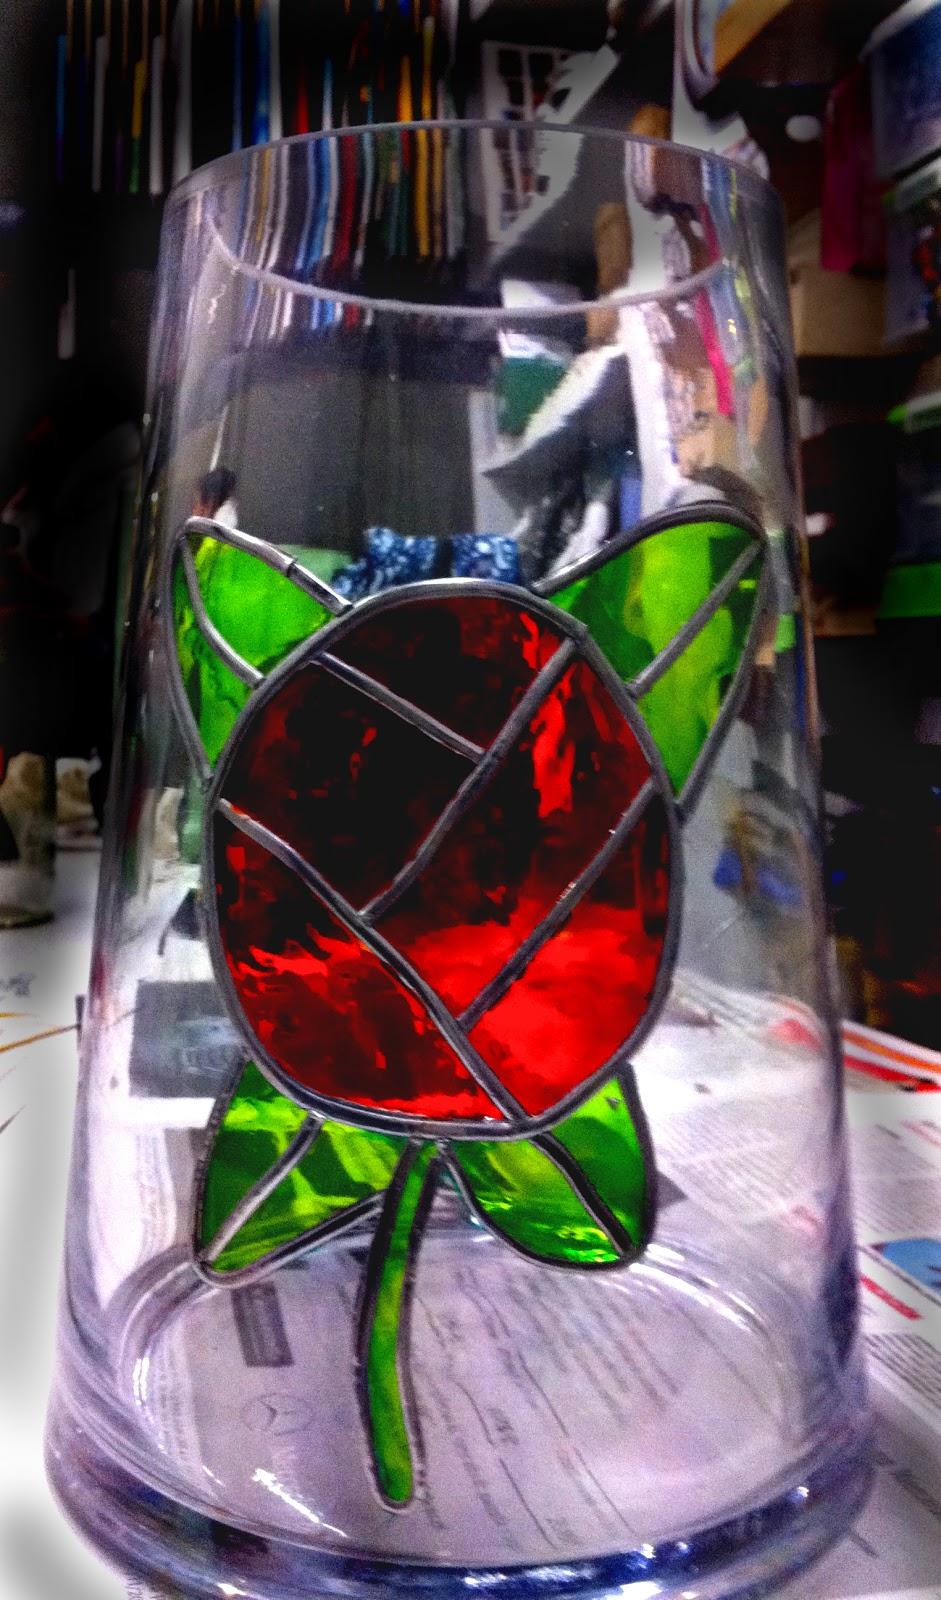 Dextra obradoiros arte t cnicas decorativas y - Tecnicas decorativas ...